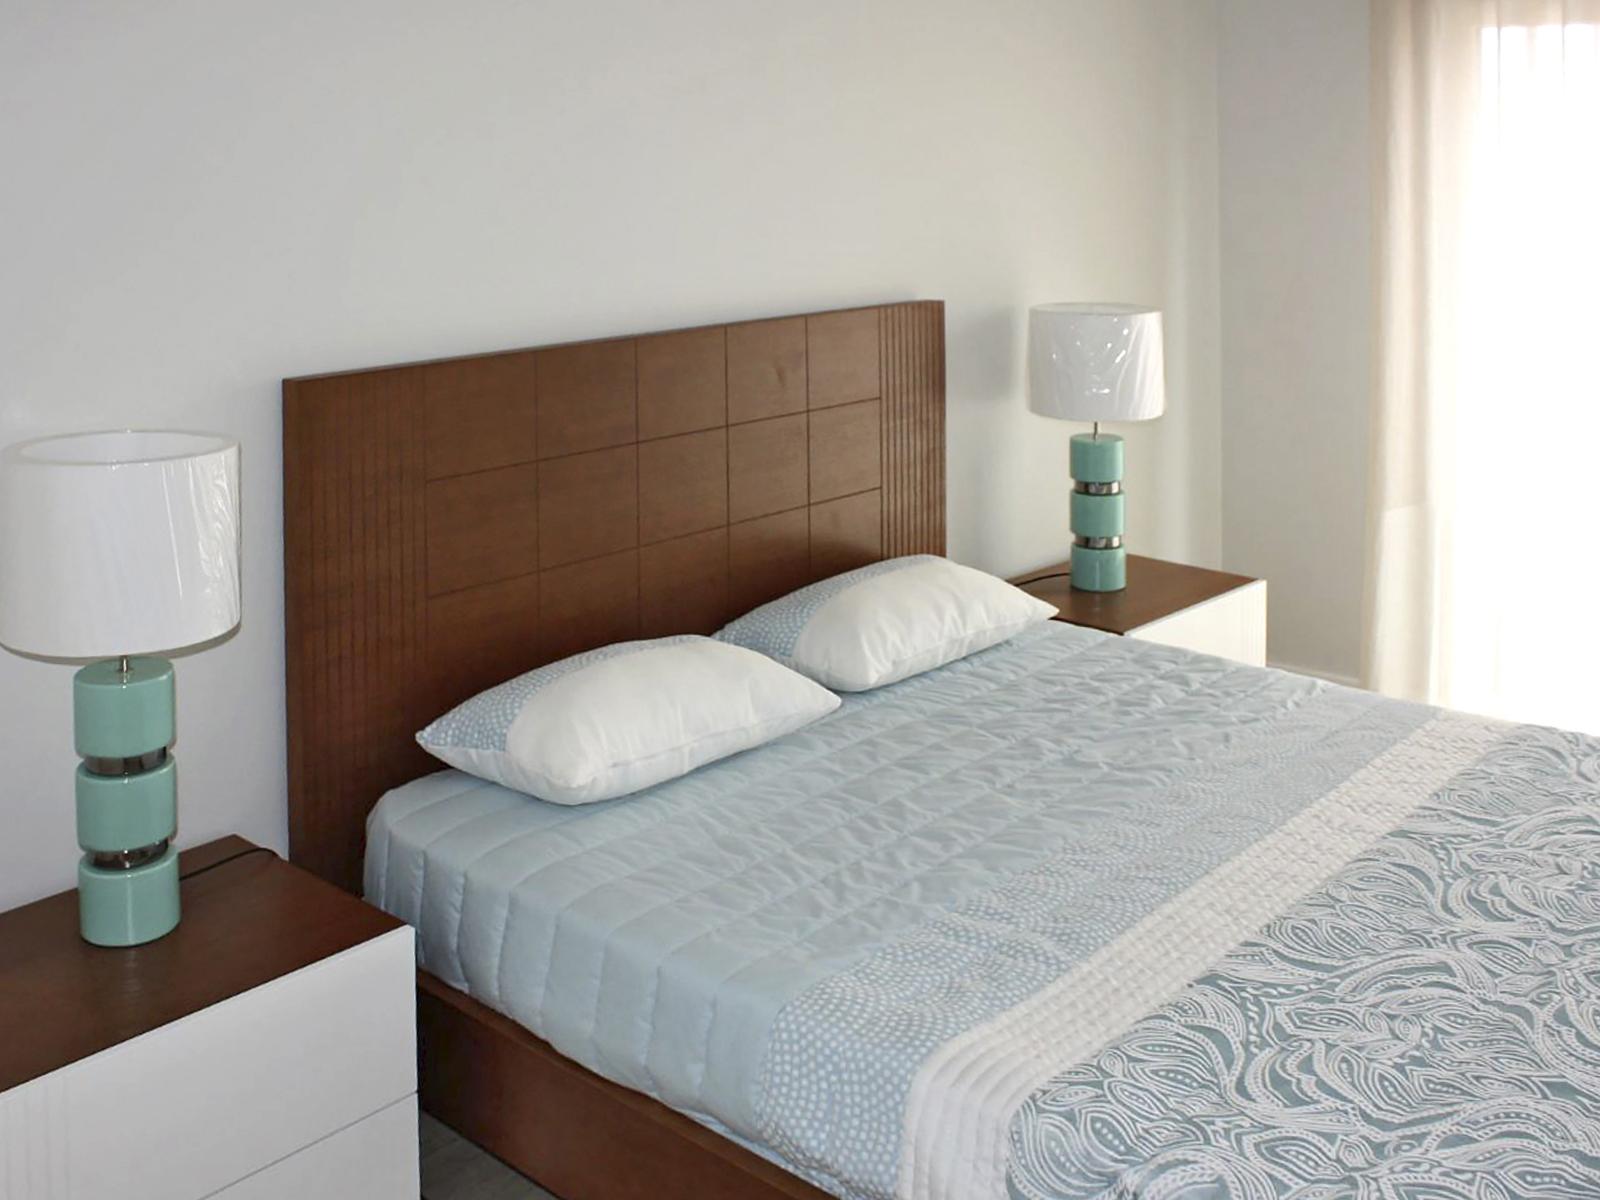 House 3 Bedrooms Condominium /Swimming pool /Santa Cruz